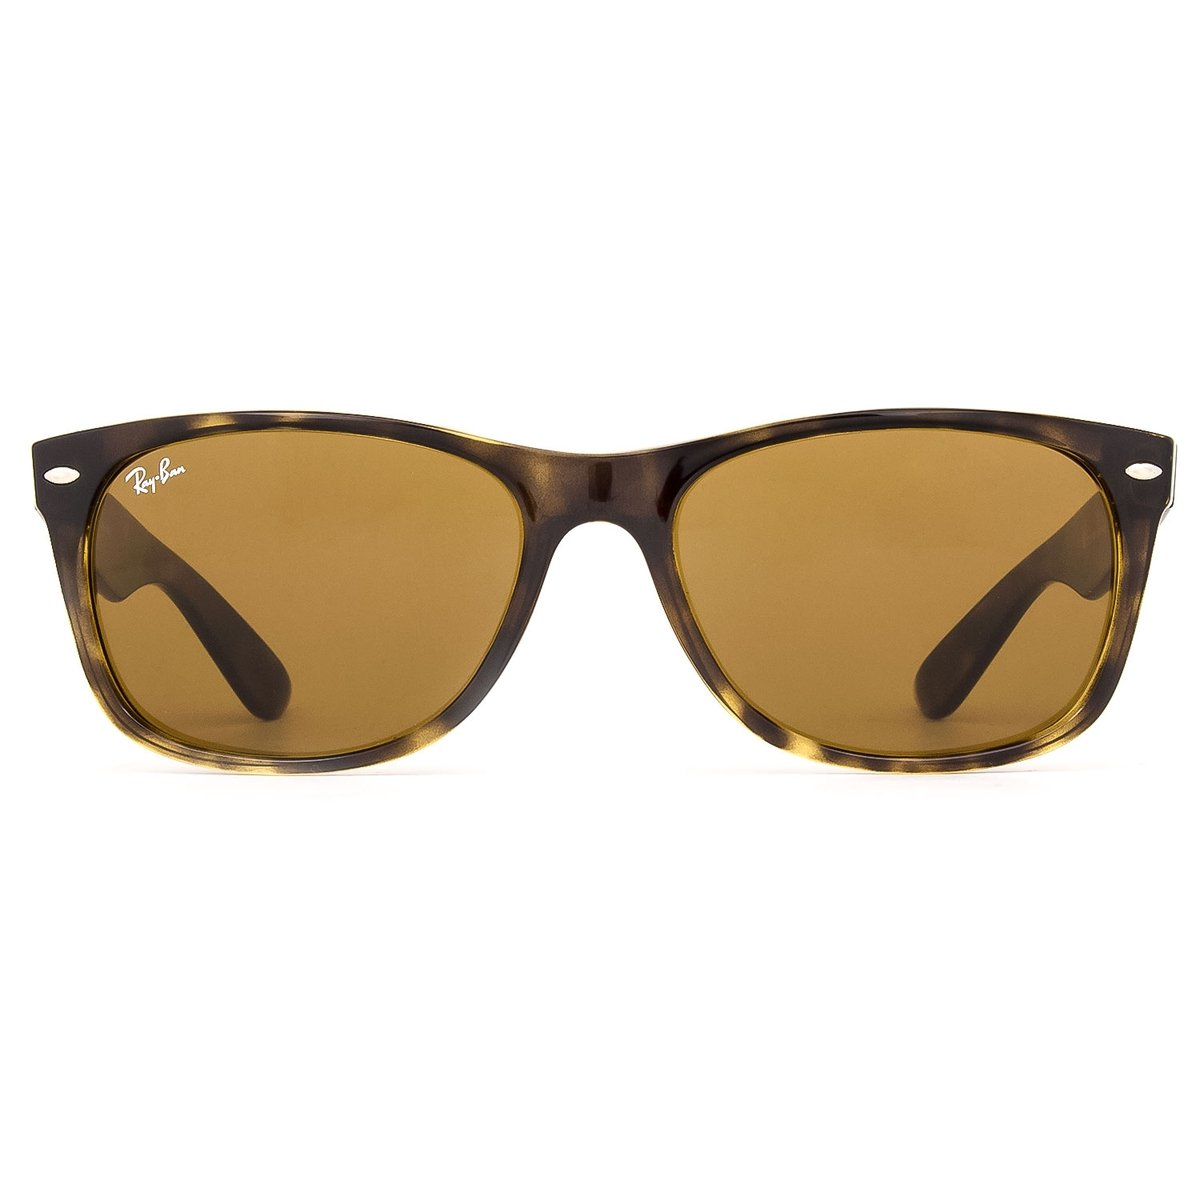 Óculos de Sol Ray Ban New Wayfarer Classic RB2132LL 710-55 Feminino - Compre  Agora   Netshoes 0c84863c6b